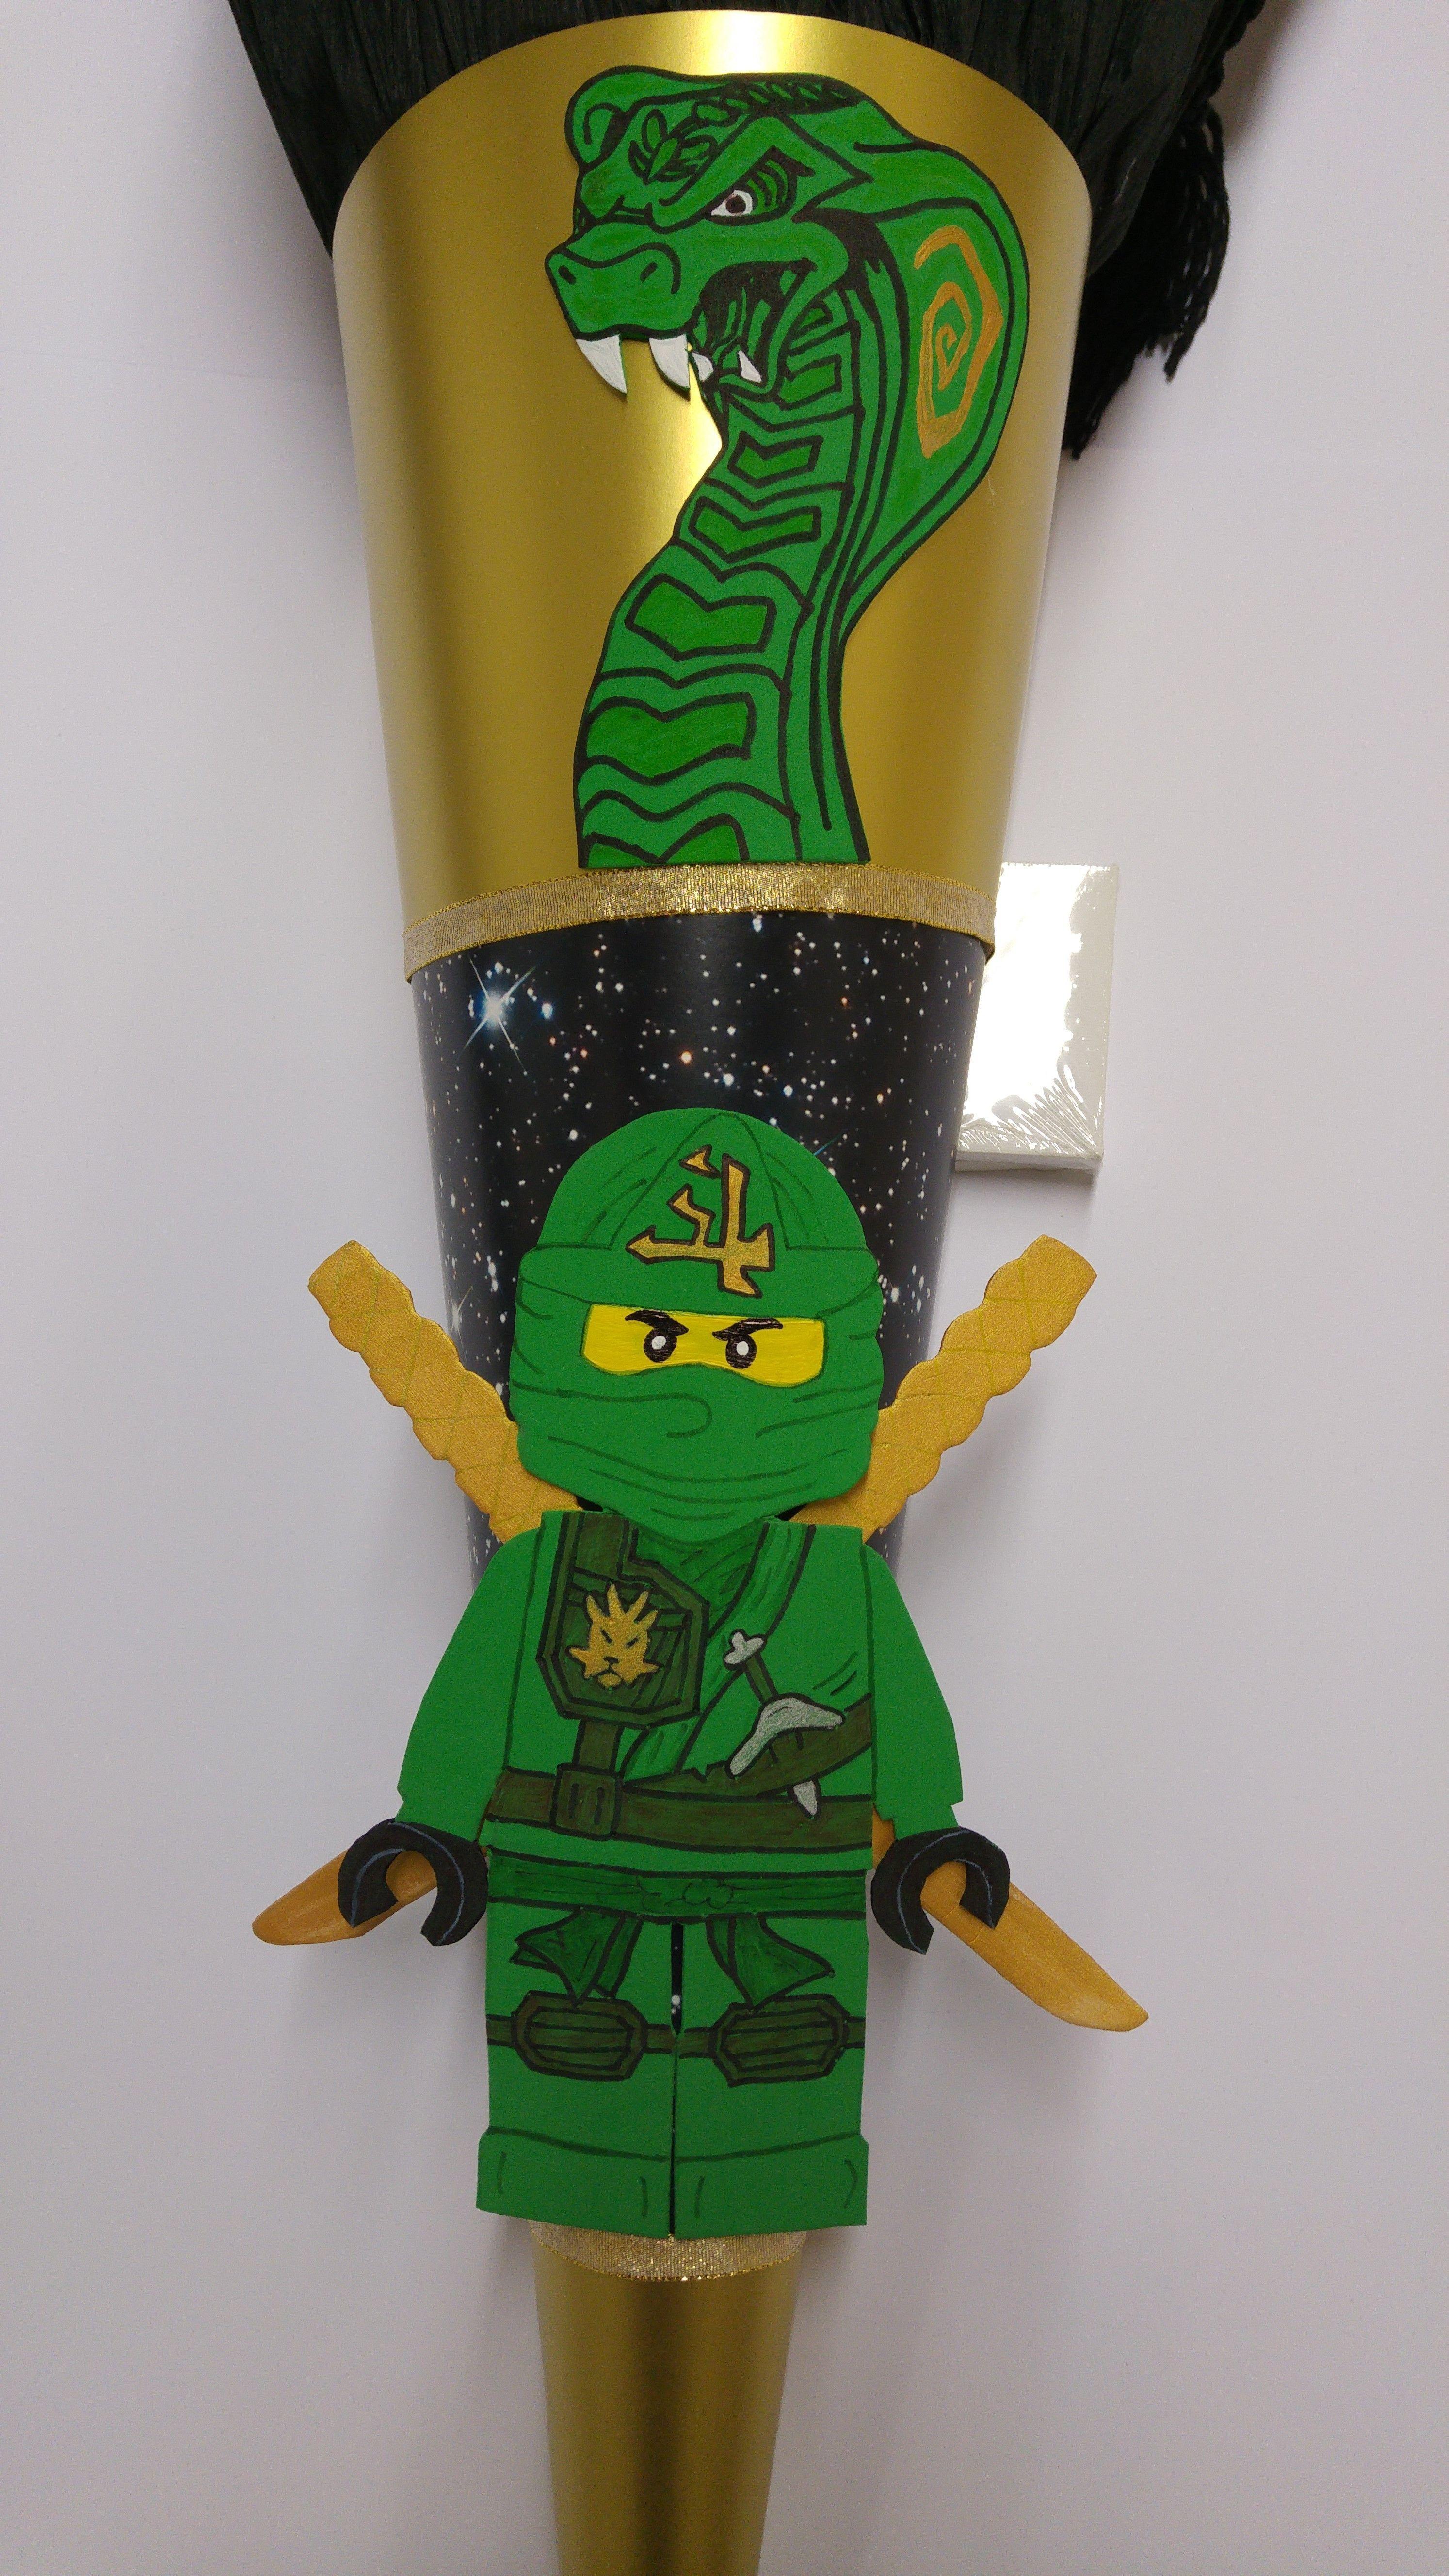 Lego Ninjago Ninja Schultute Green Grun In 2020 Lego Ninjago Ninja Lego Ninjago Ninjago